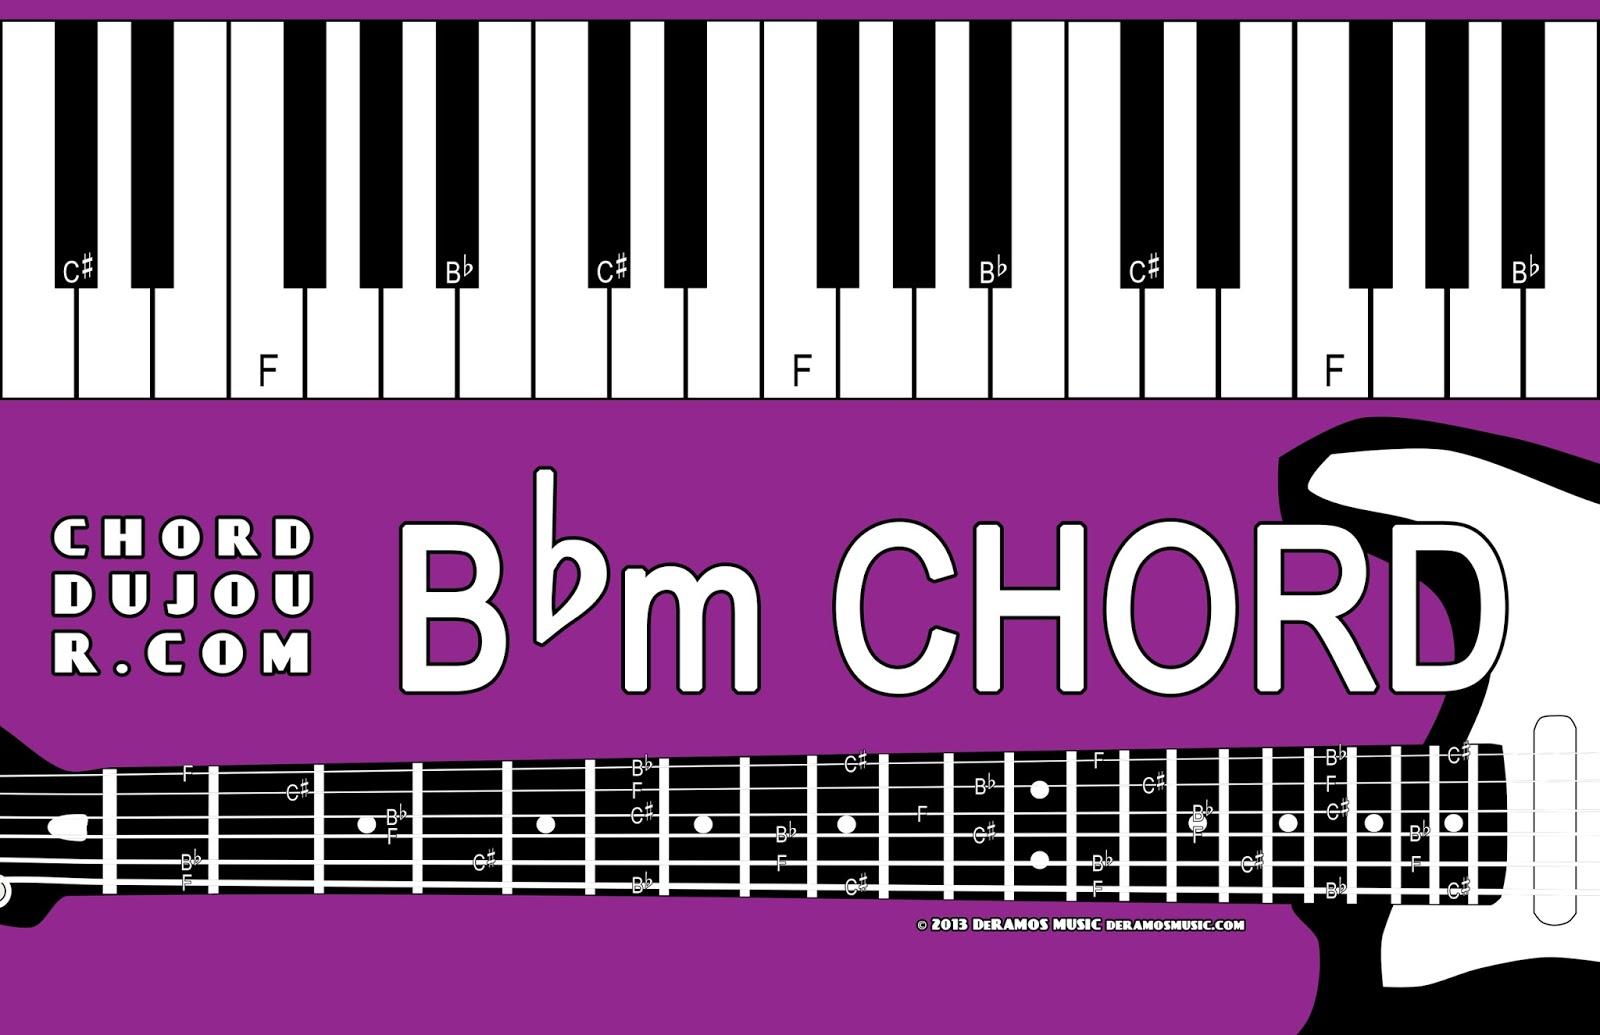 Chord Du Jour Dictionary Bbm Chord